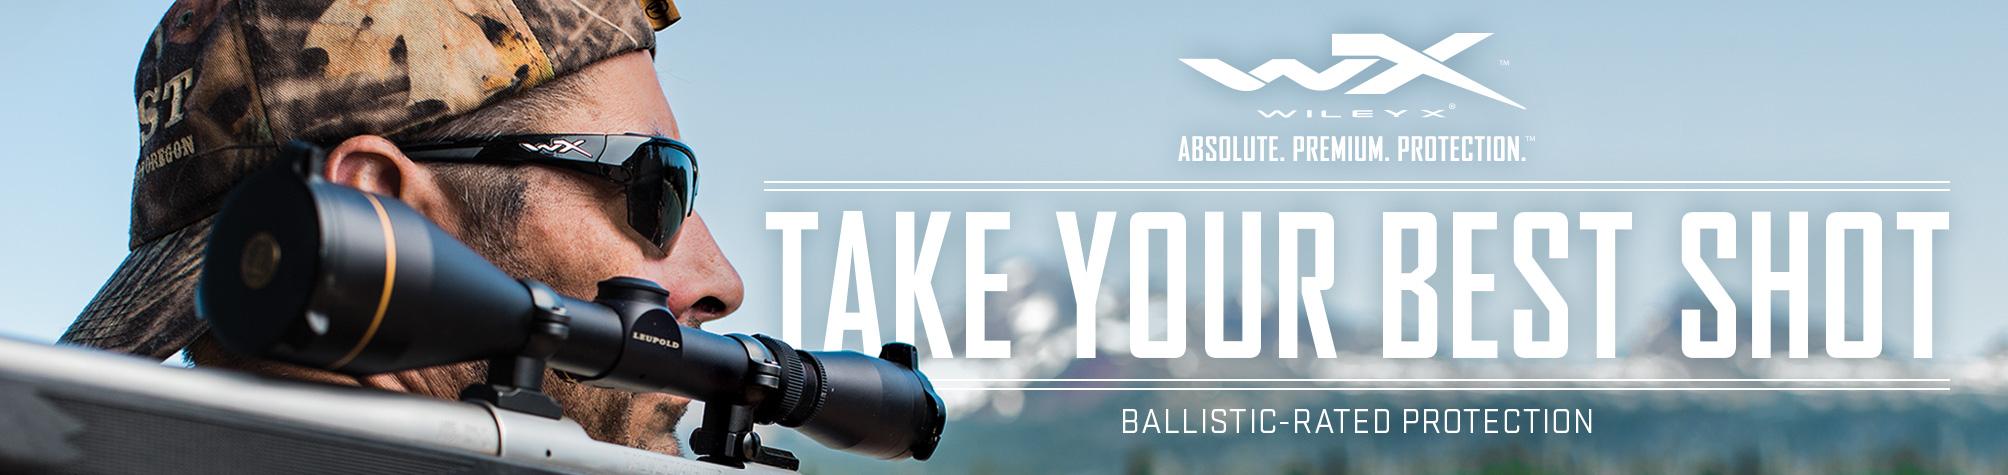 Outdoor_Take_Your_Best_Shot_Banner.jpg